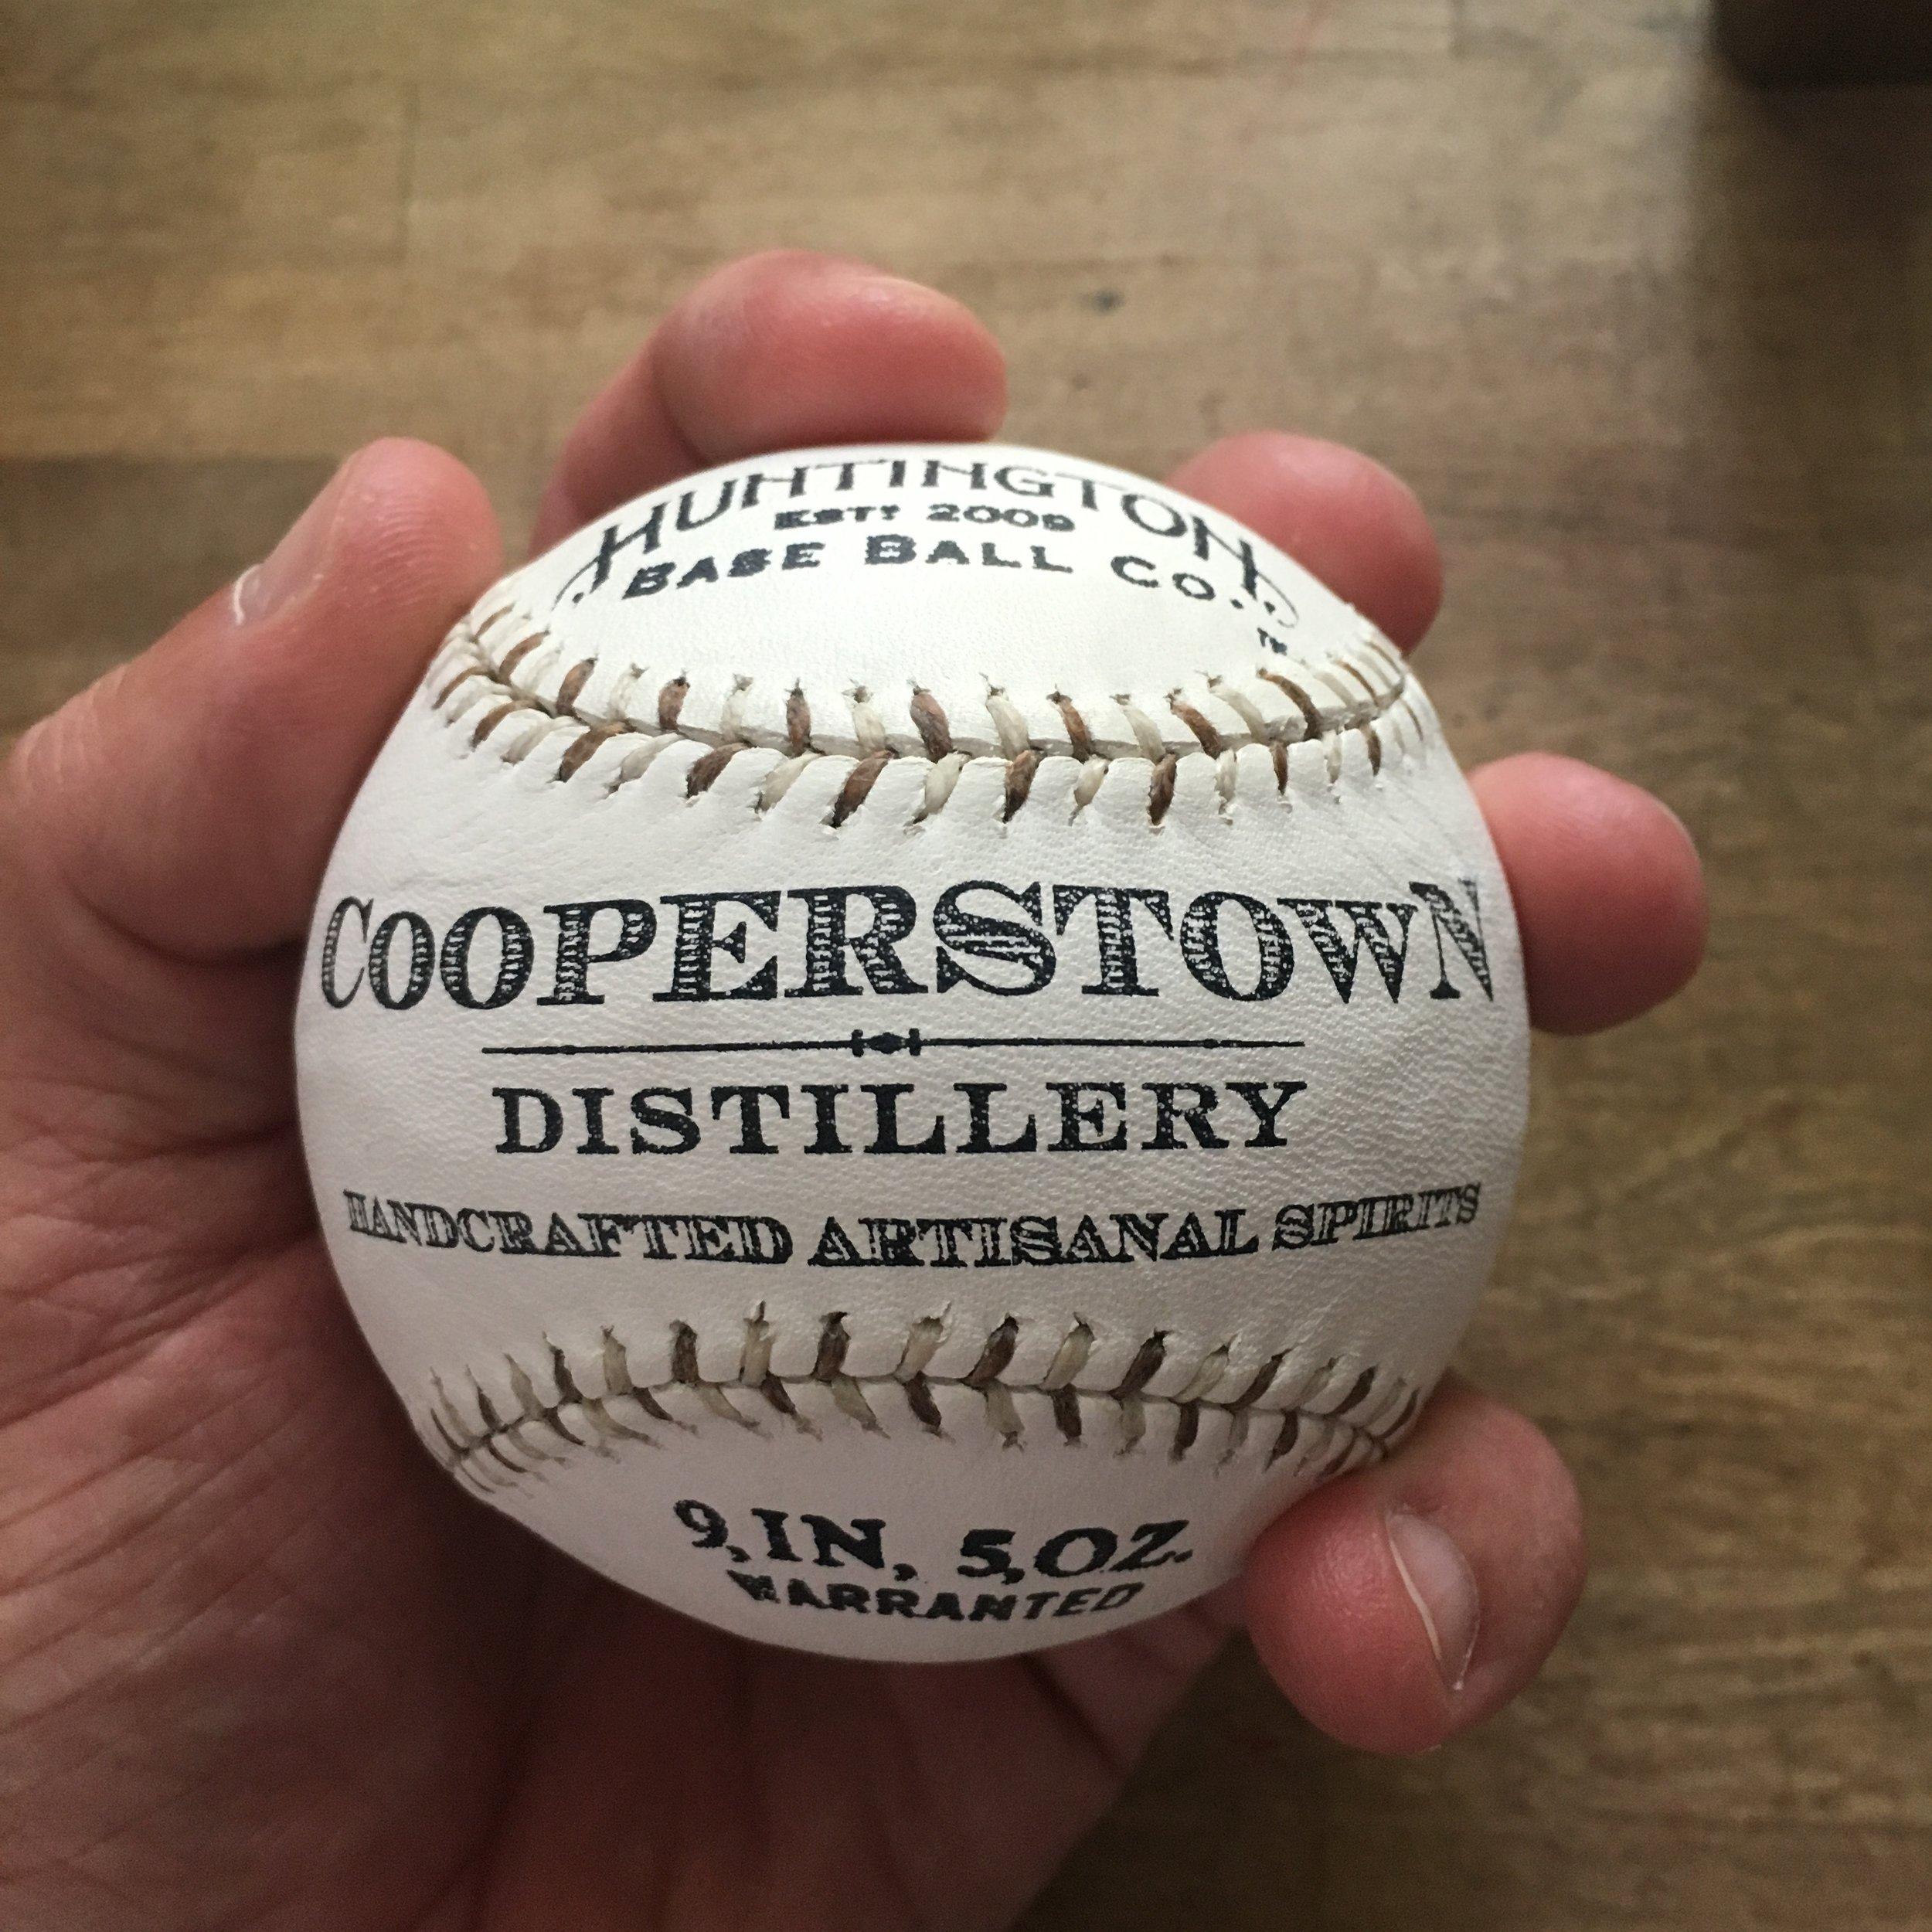 CooperstownDistillery.jpg